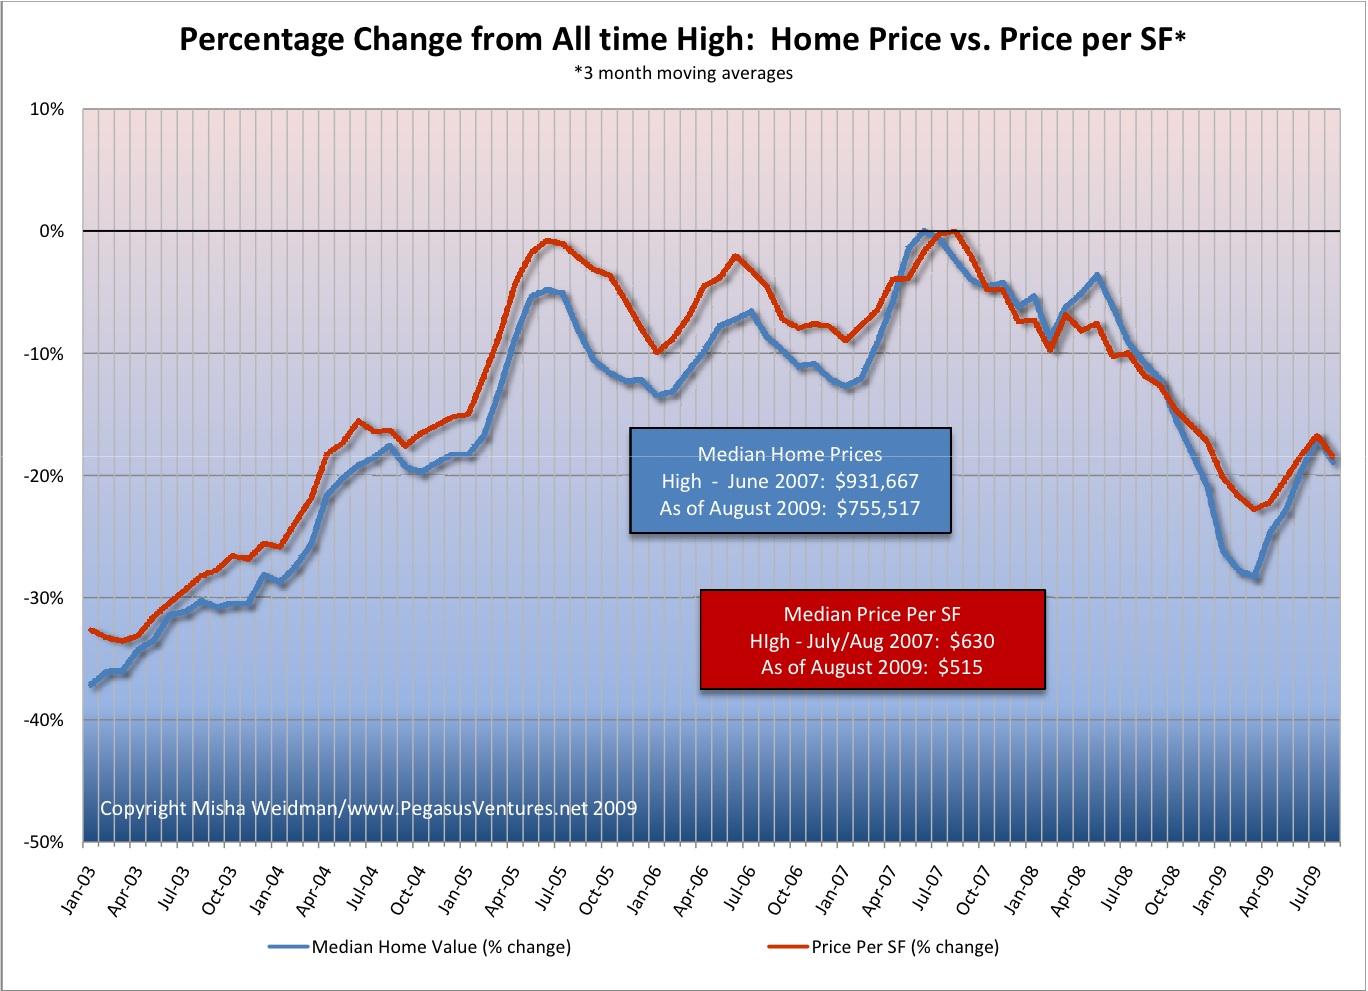 Median Prices Homes vs Per SF